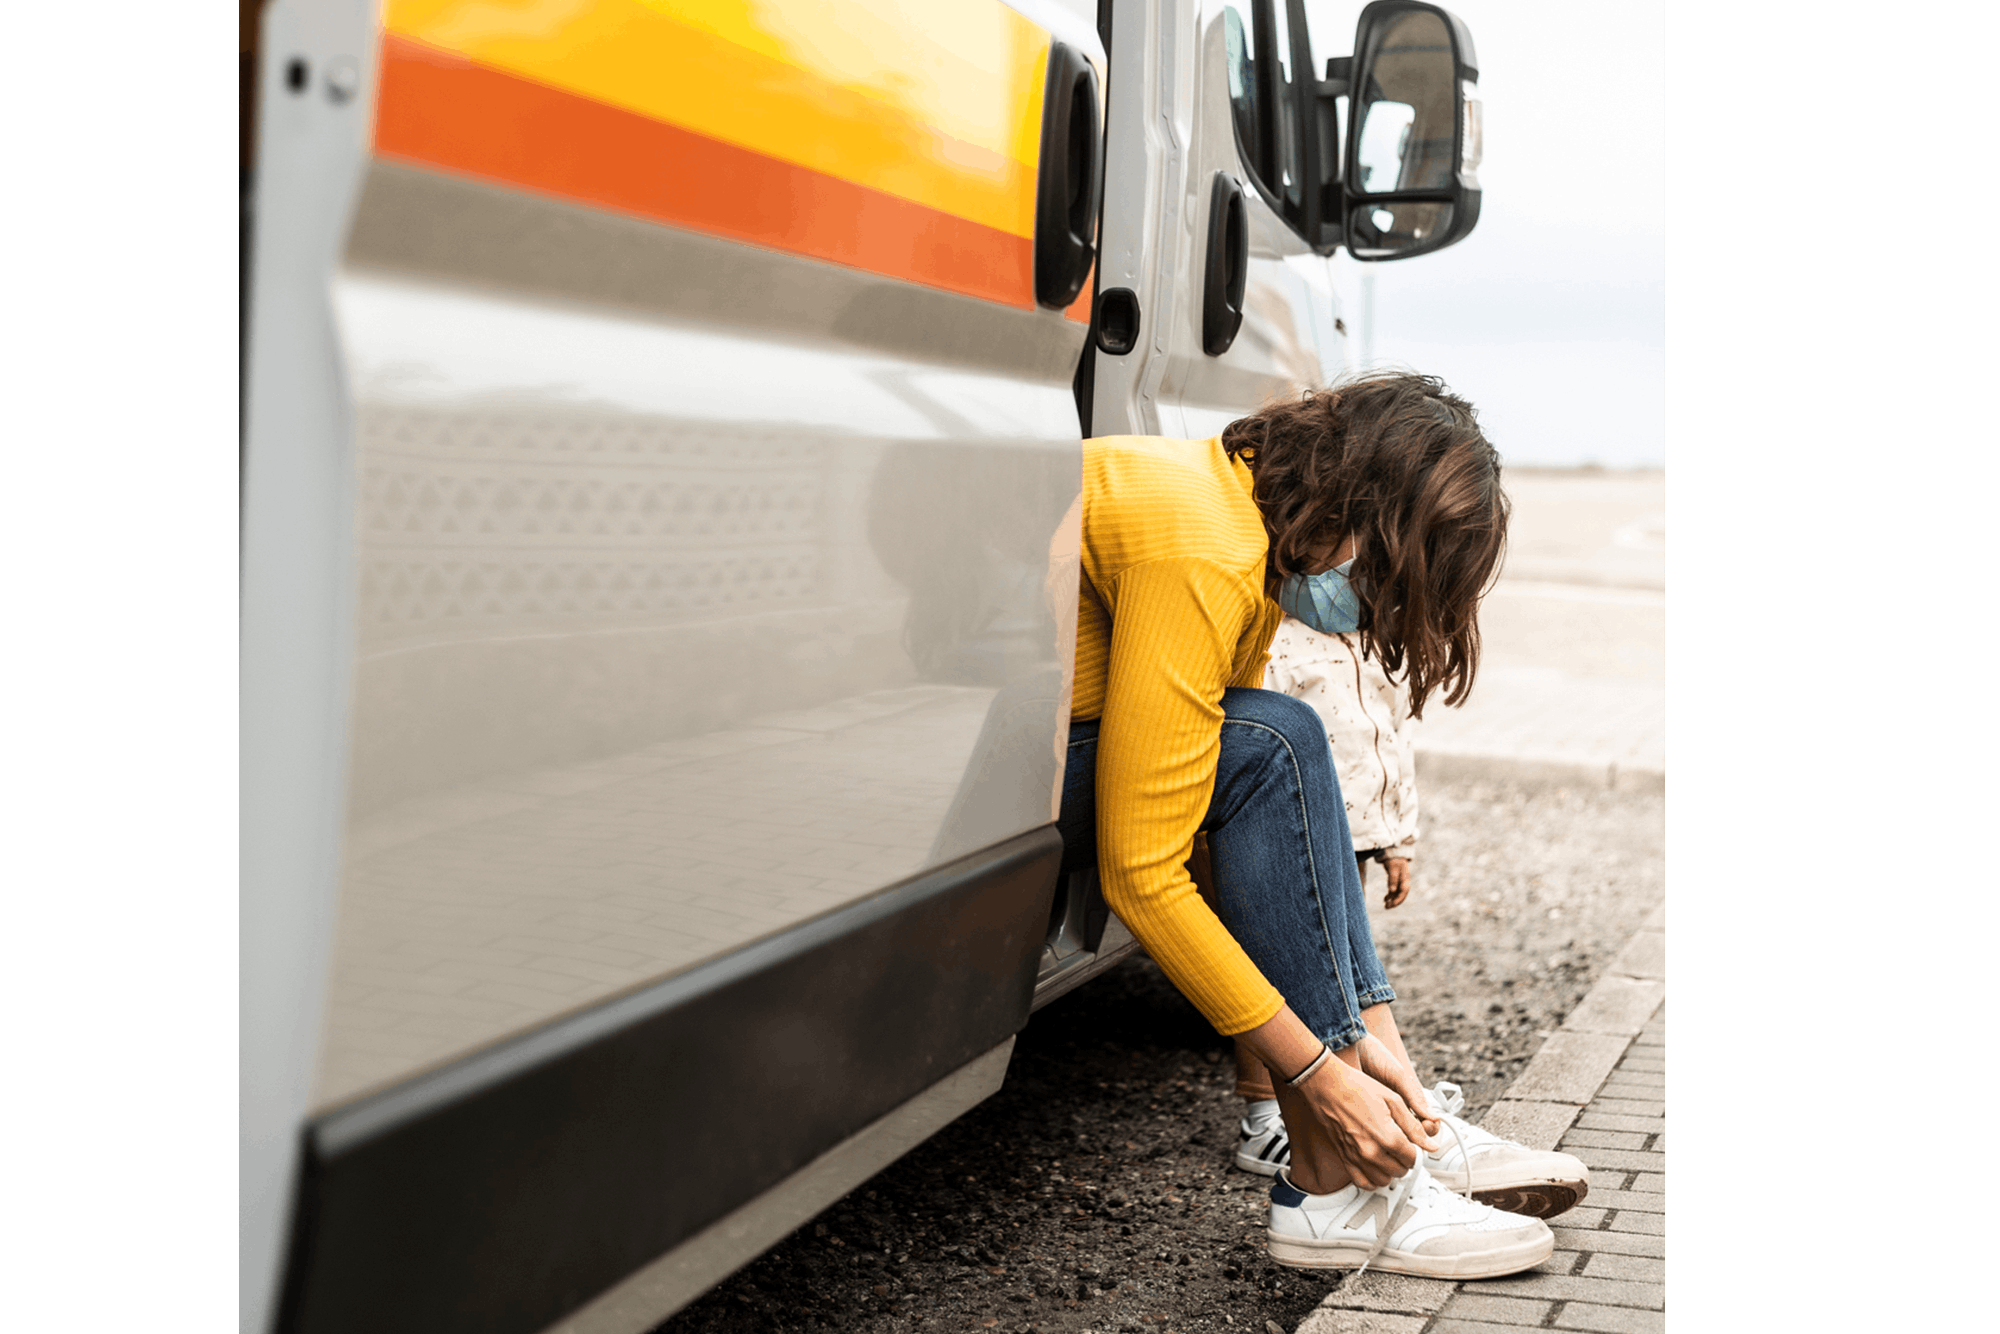 Reisen mit dem Wohnmobil Corona  Indie Campers